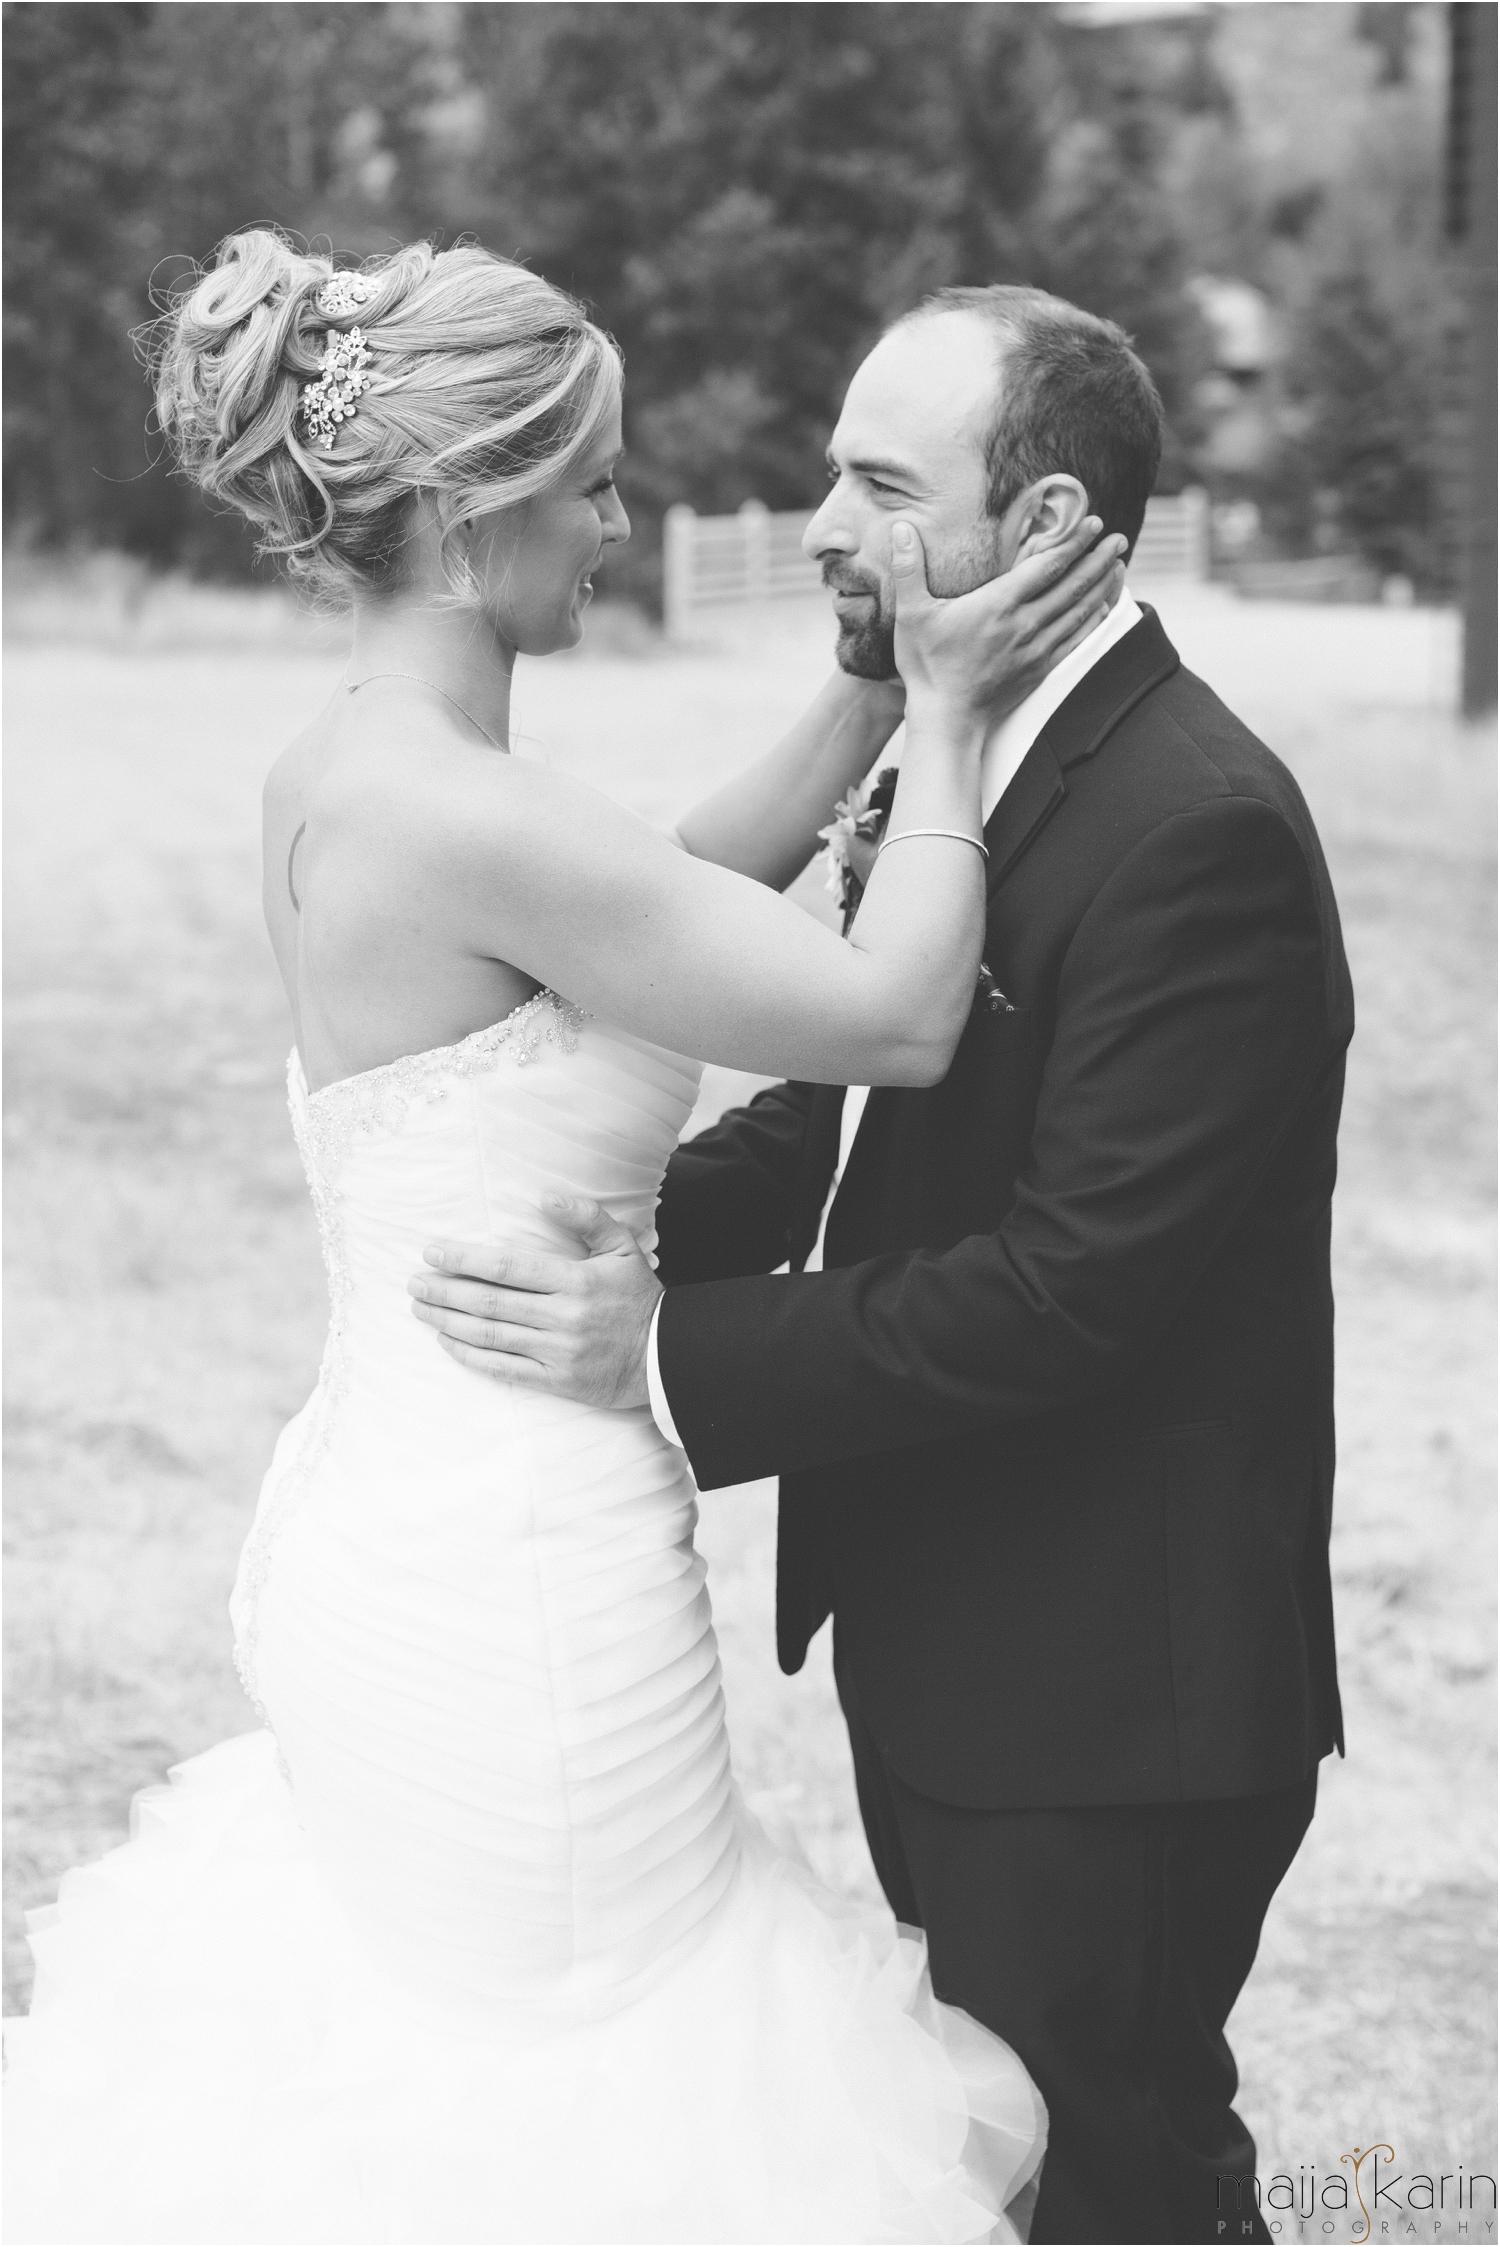 stree-free-images-wedding-guide-maija-karin-photography_0010.jpg